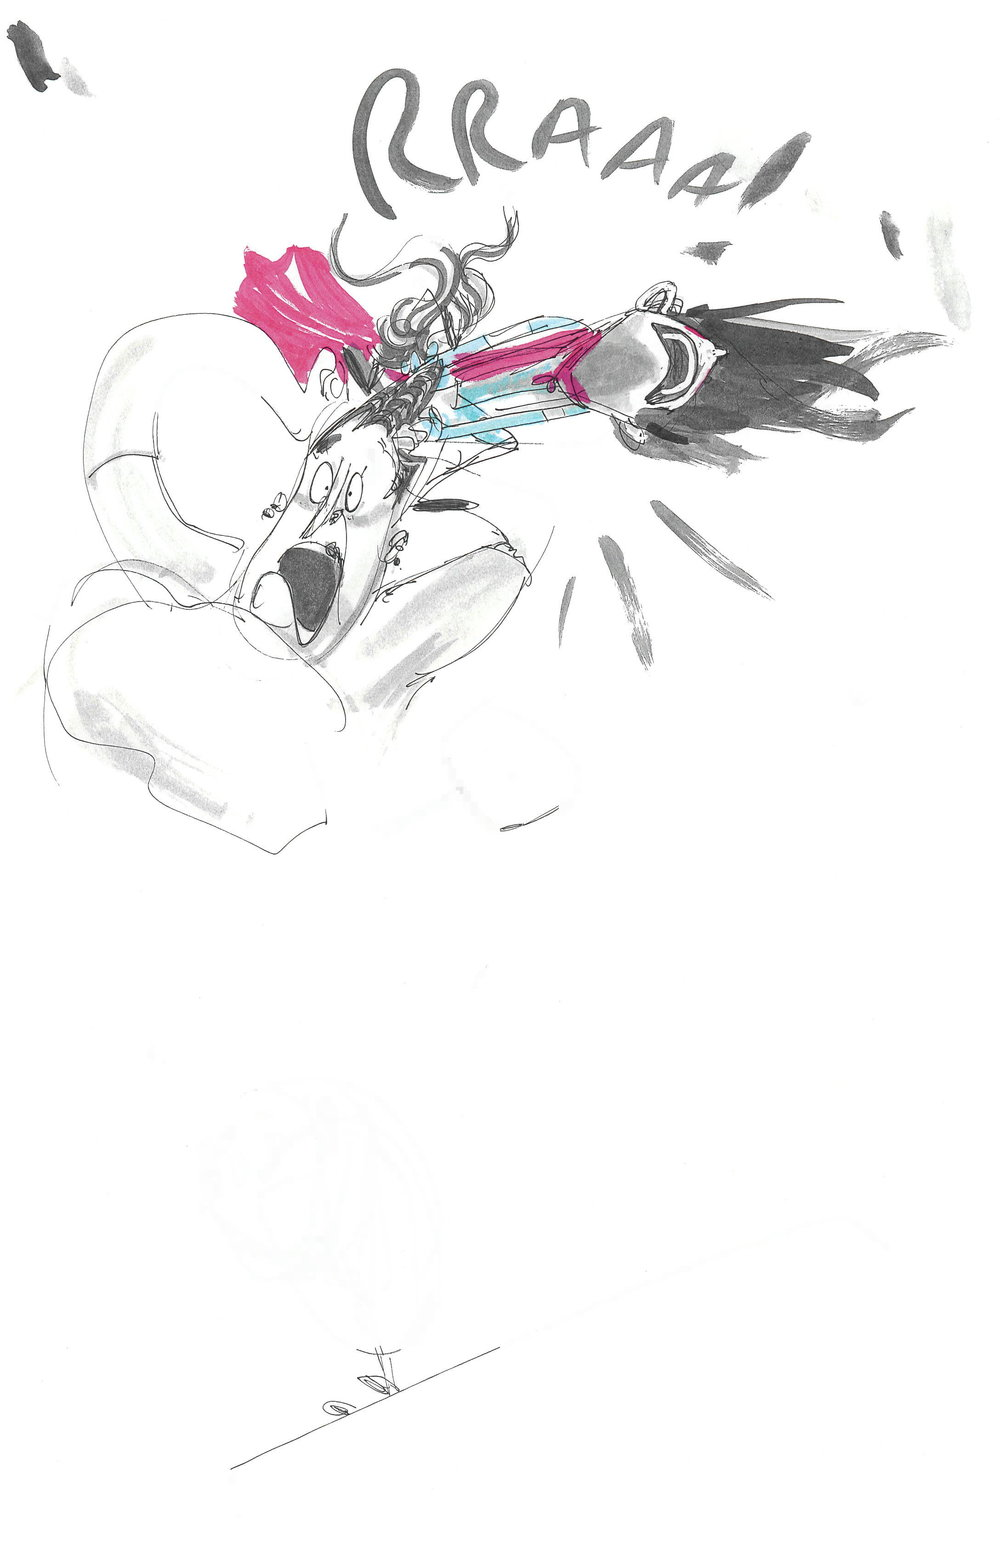 BRIANWONDERS-sketches-1_Page_17_Image_0001.jpg